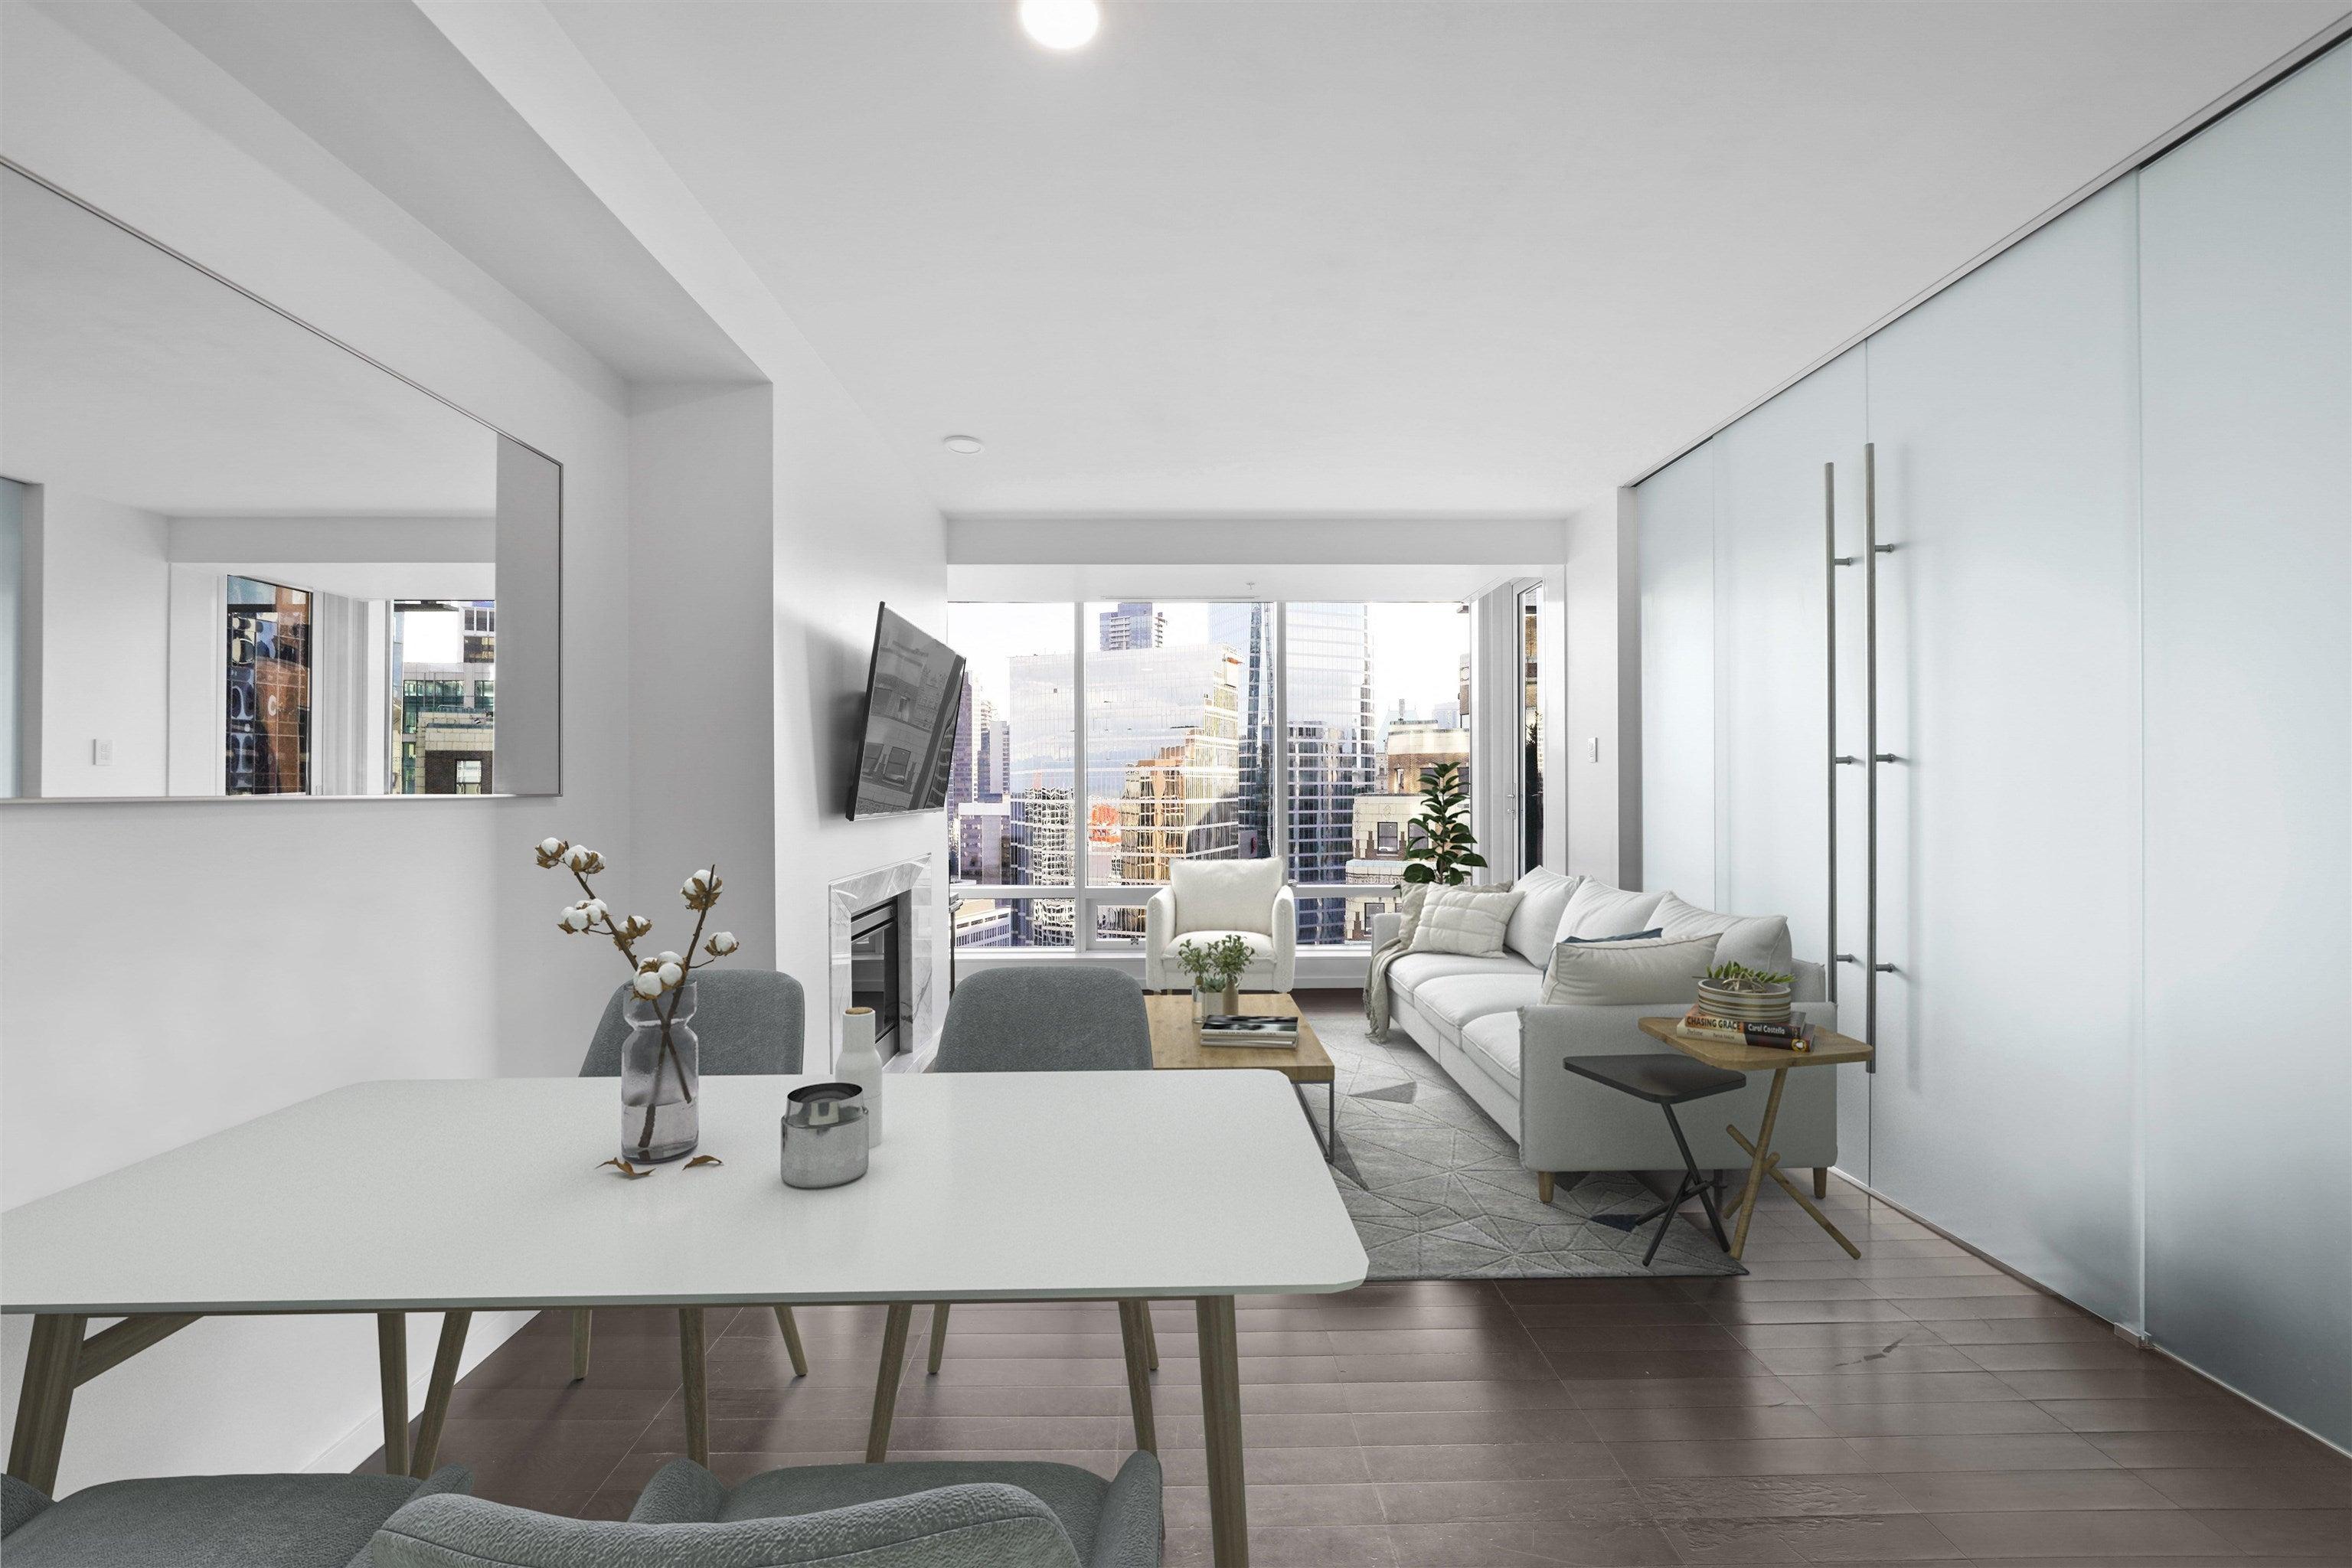 2604 1011 W CORDOVA STREET - Coal Harbour Apartment/Condo for sale, 1 Bedroom (R2618214) - #1